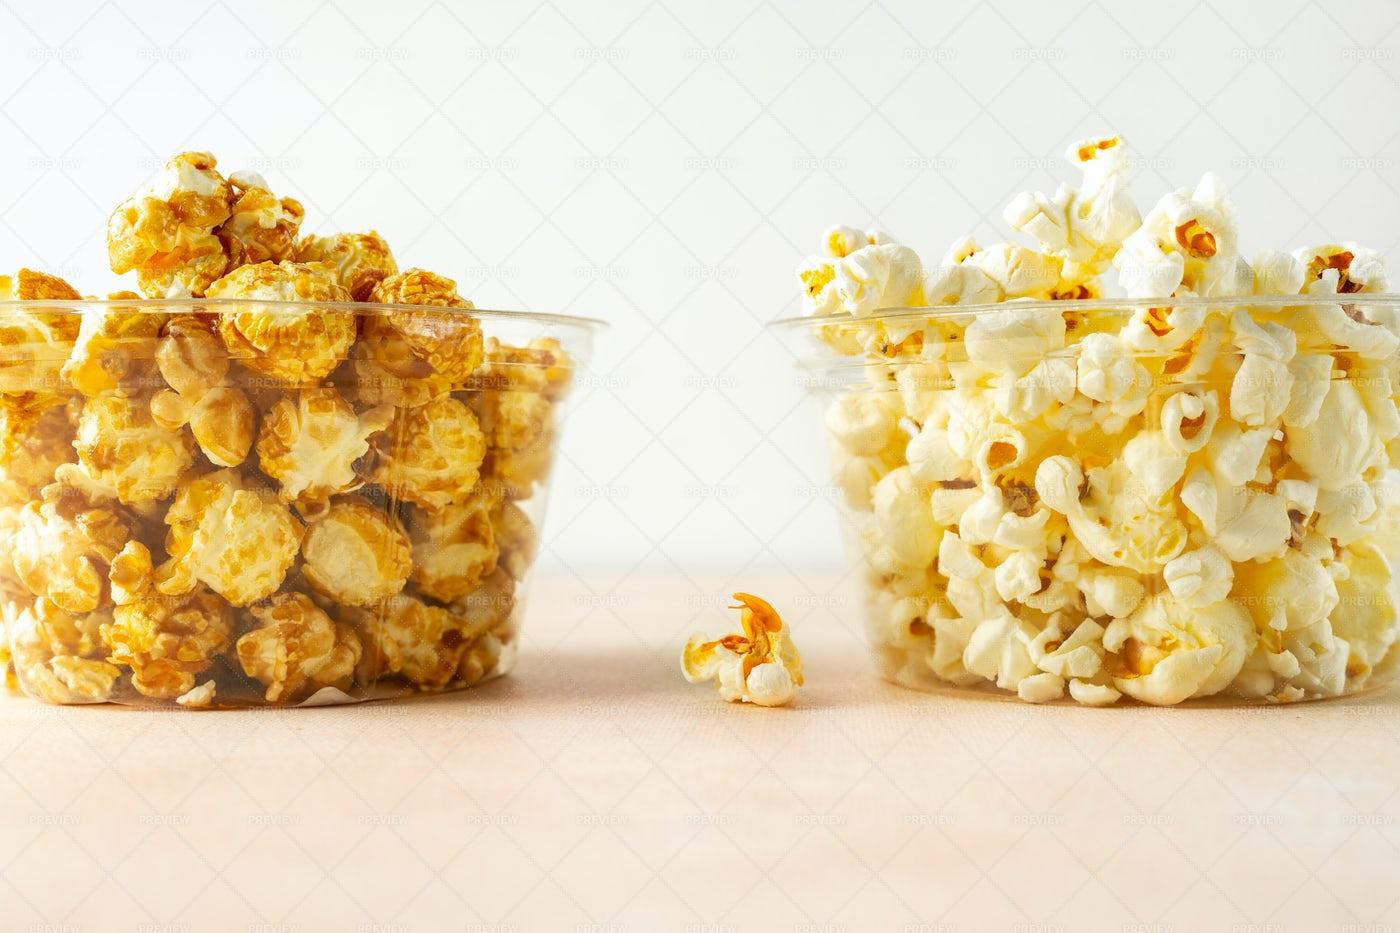 Tubs Of Popcorn: Stock Photos